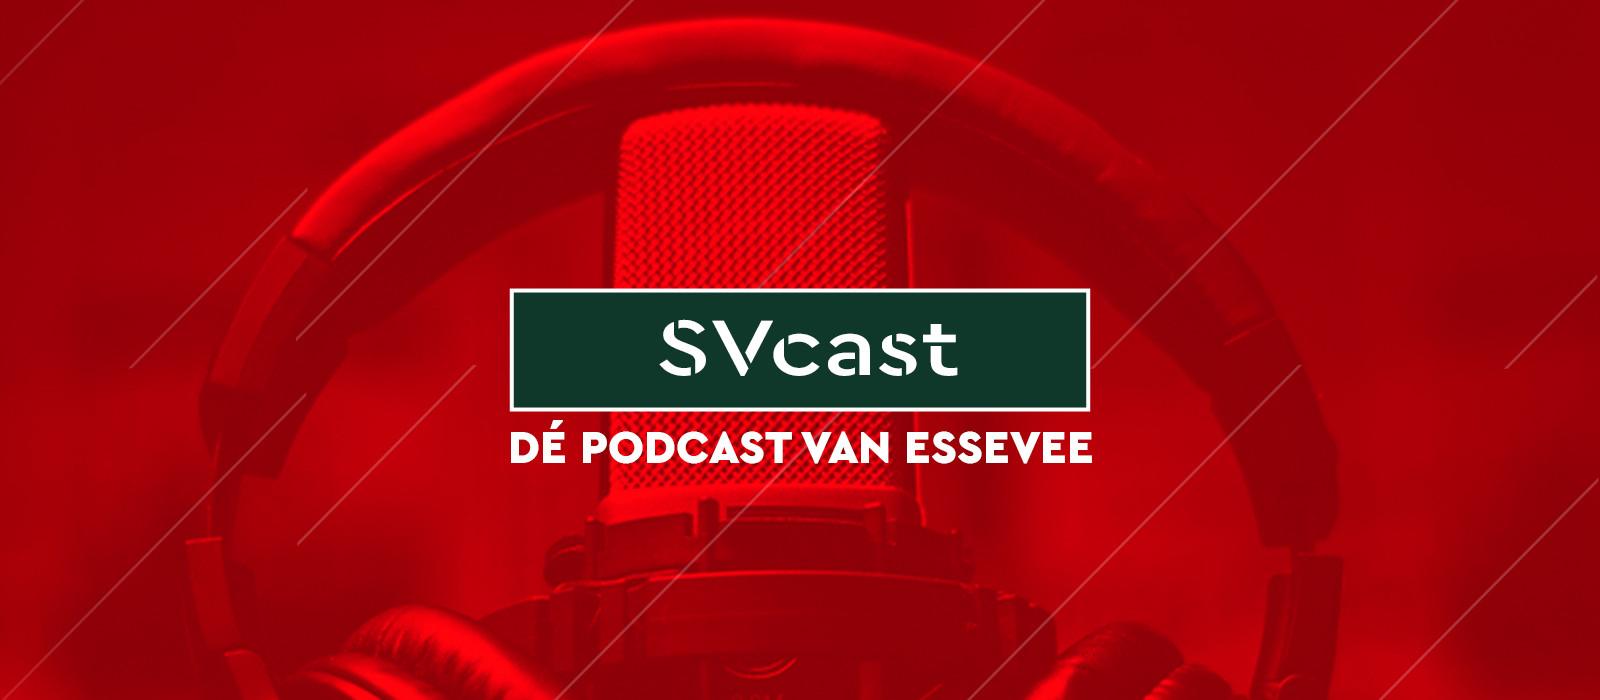 webbanner_SVcast.jpg